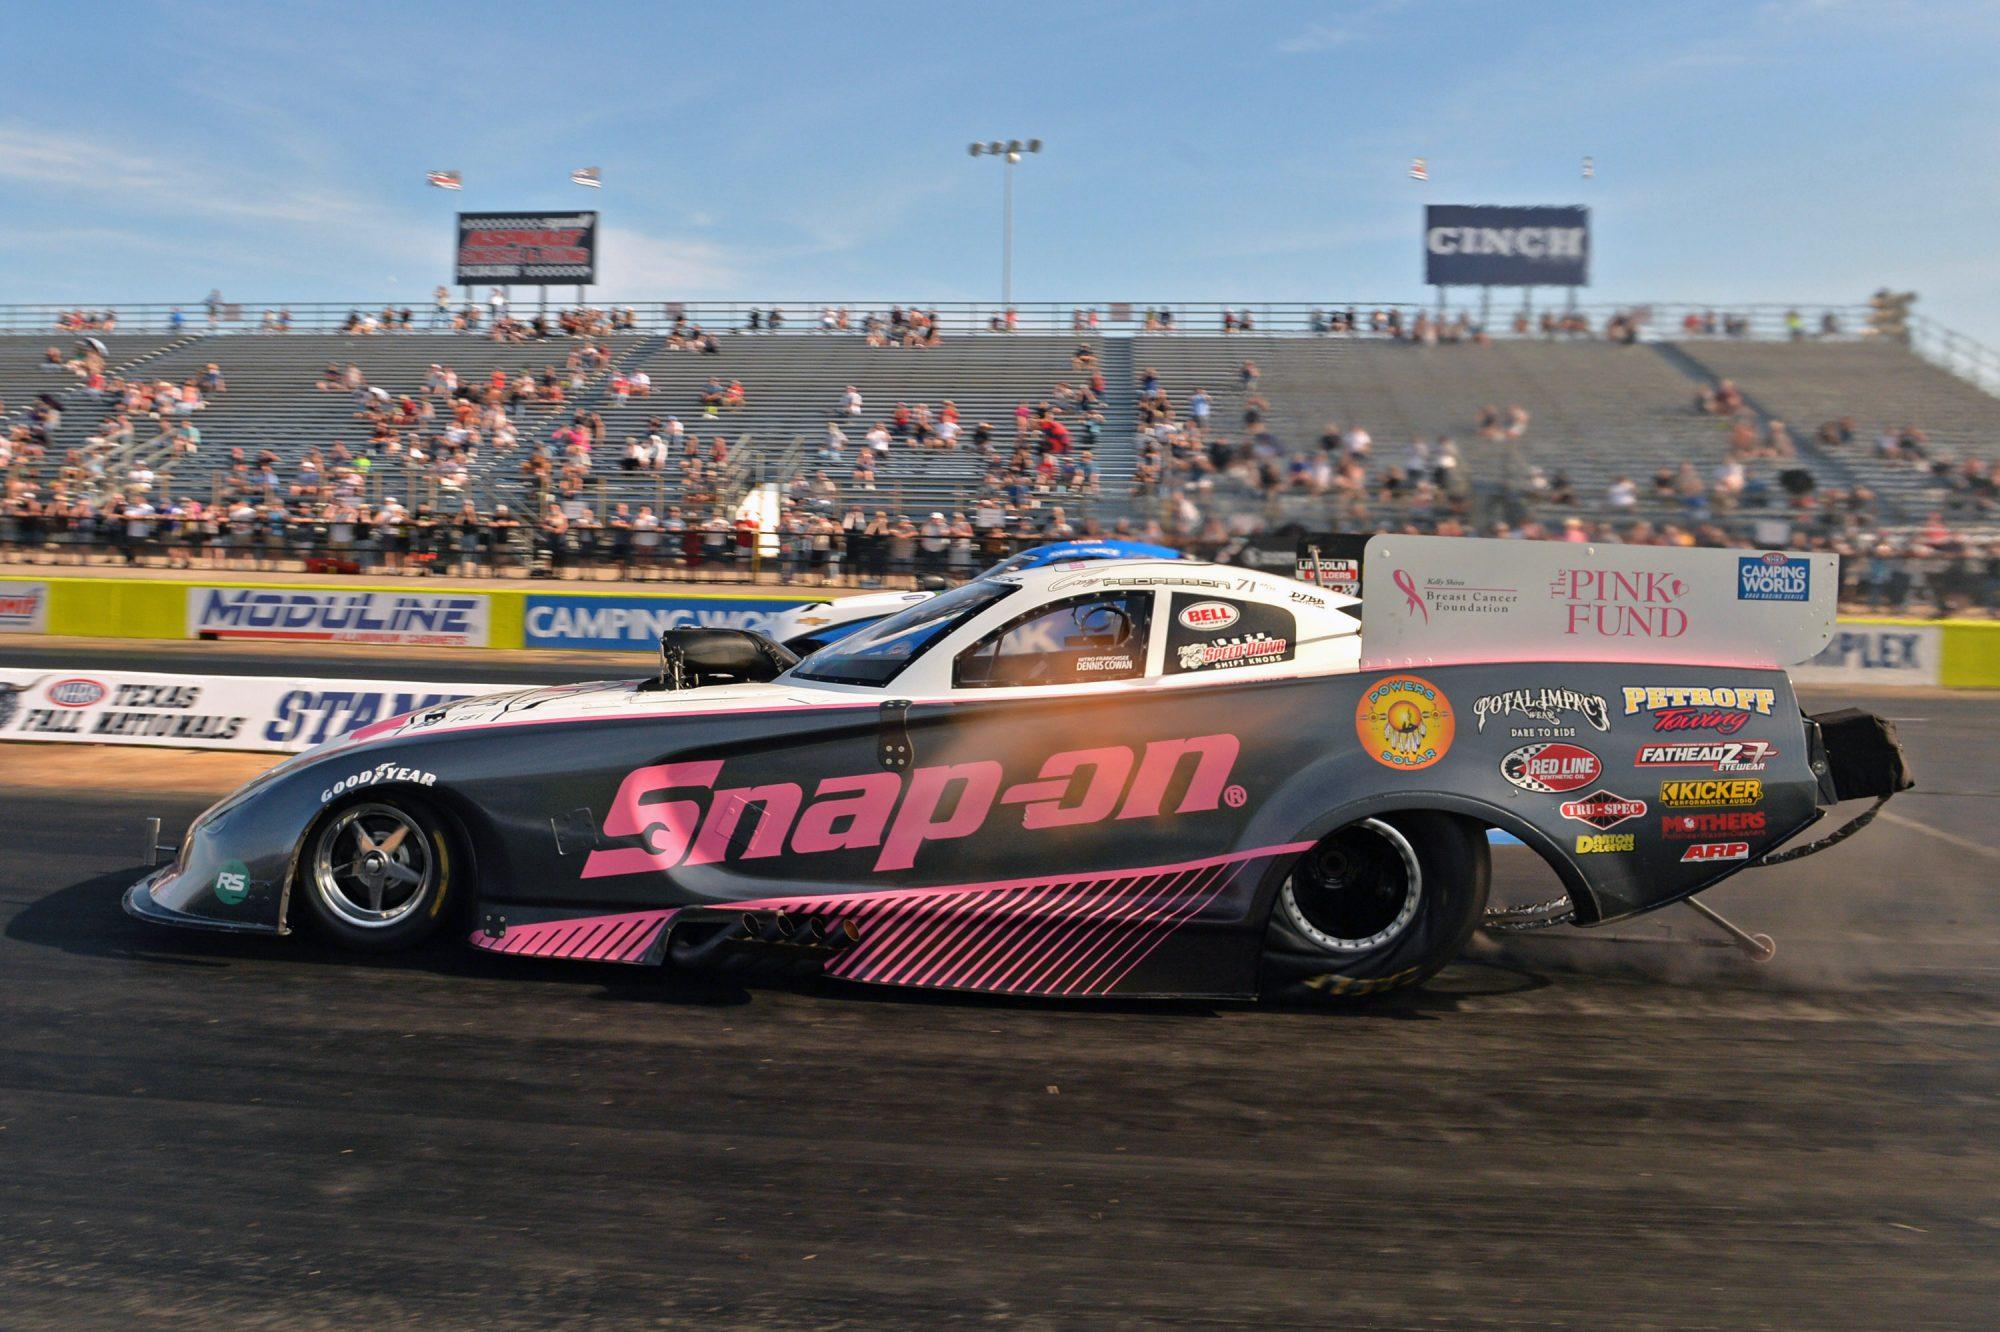 Cruz Pedregon drag racing